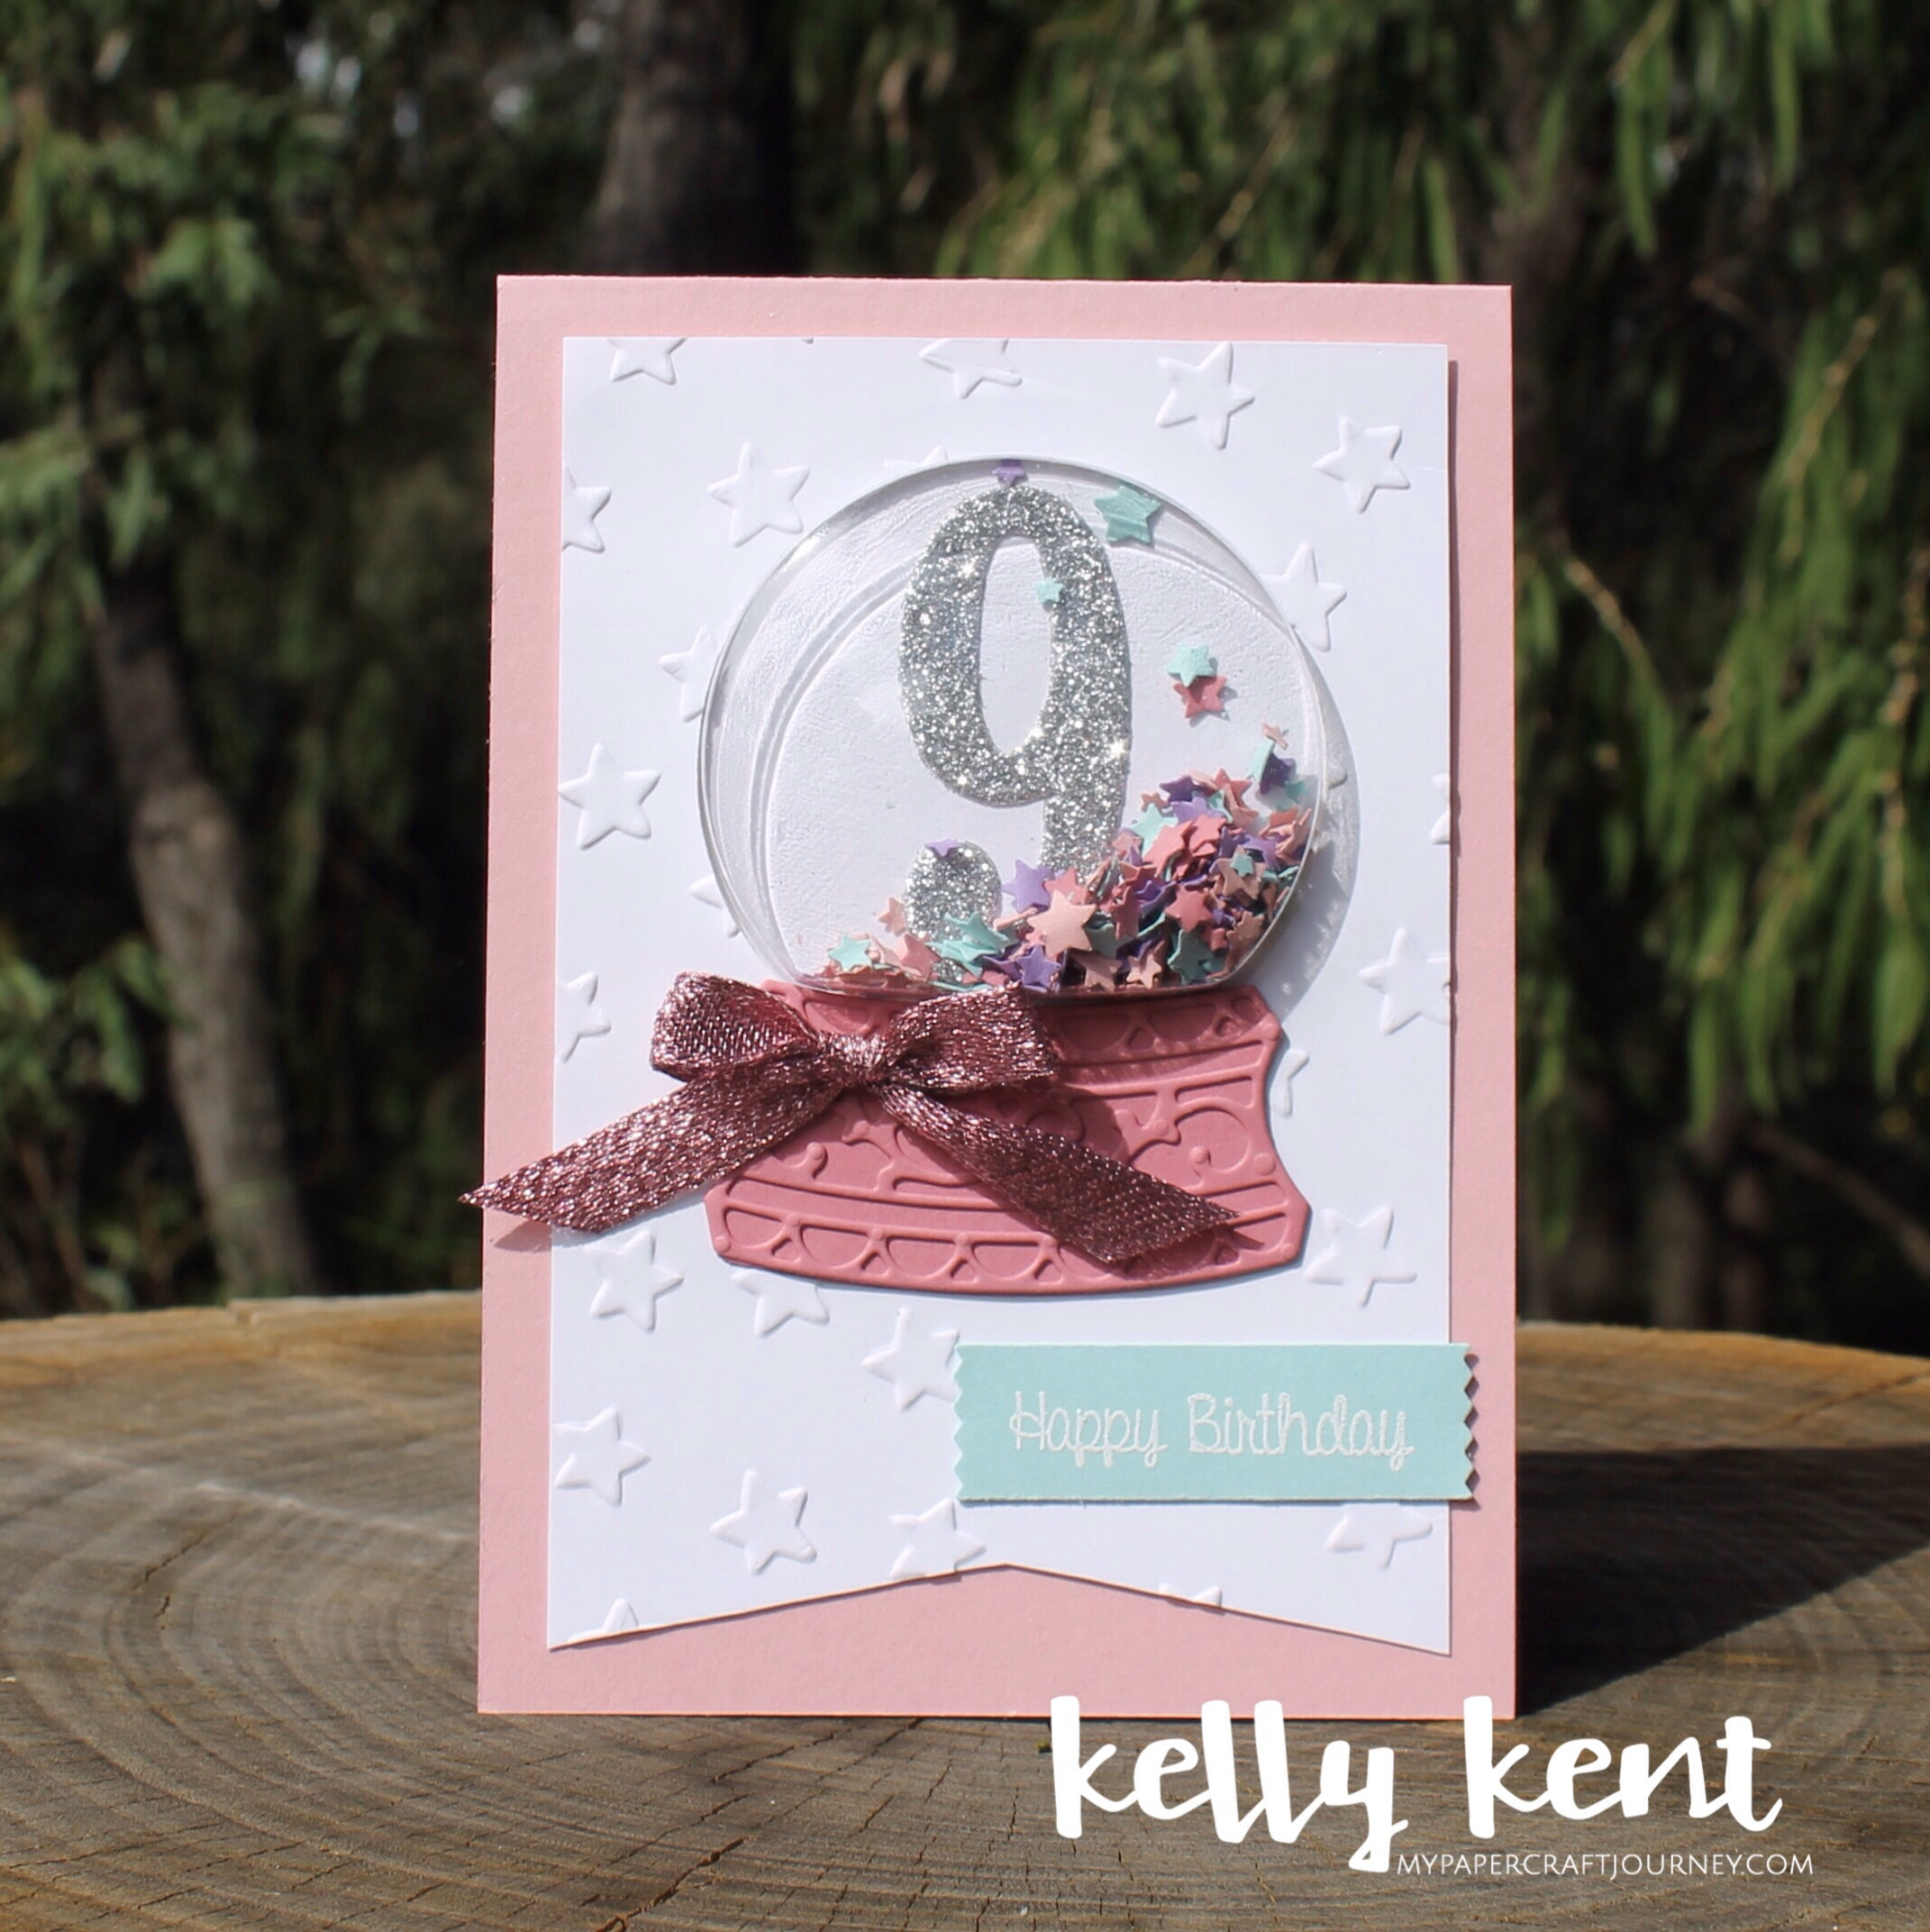 Snow Globe - 9th birthday | kelly kent